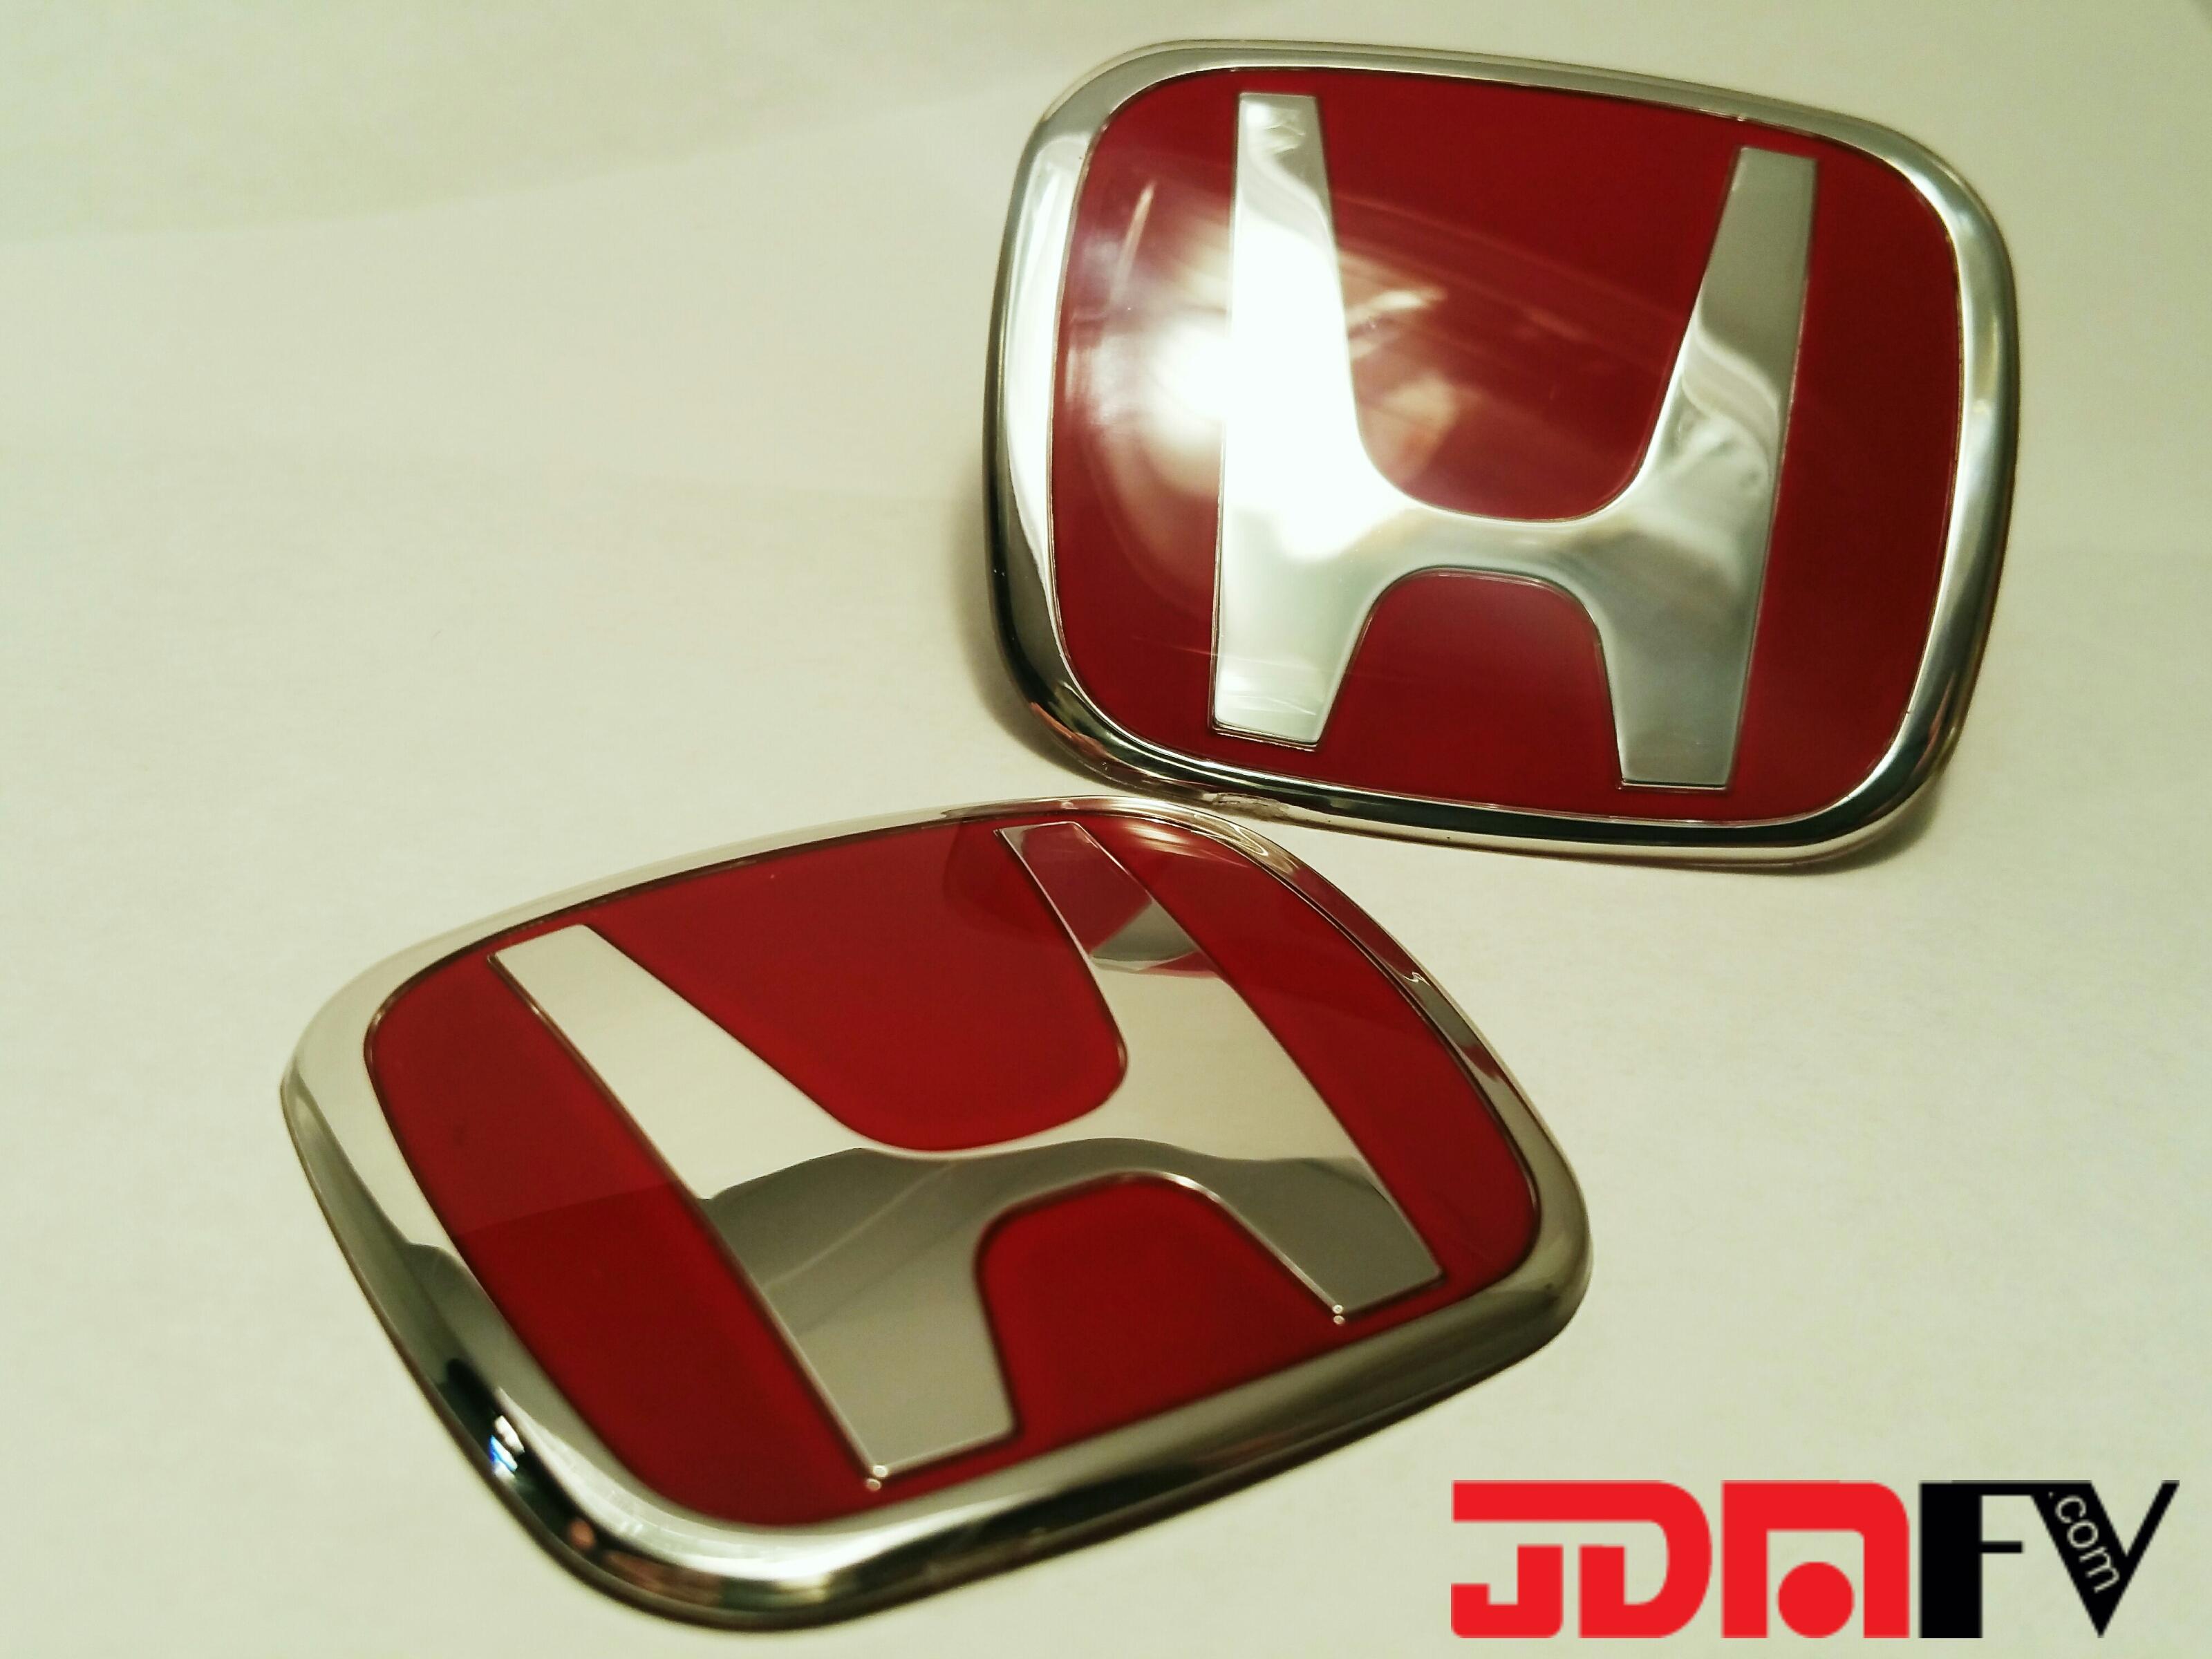 jdm-honda-h-steering-wheel-emblems-red-2-jdmfv.jpg